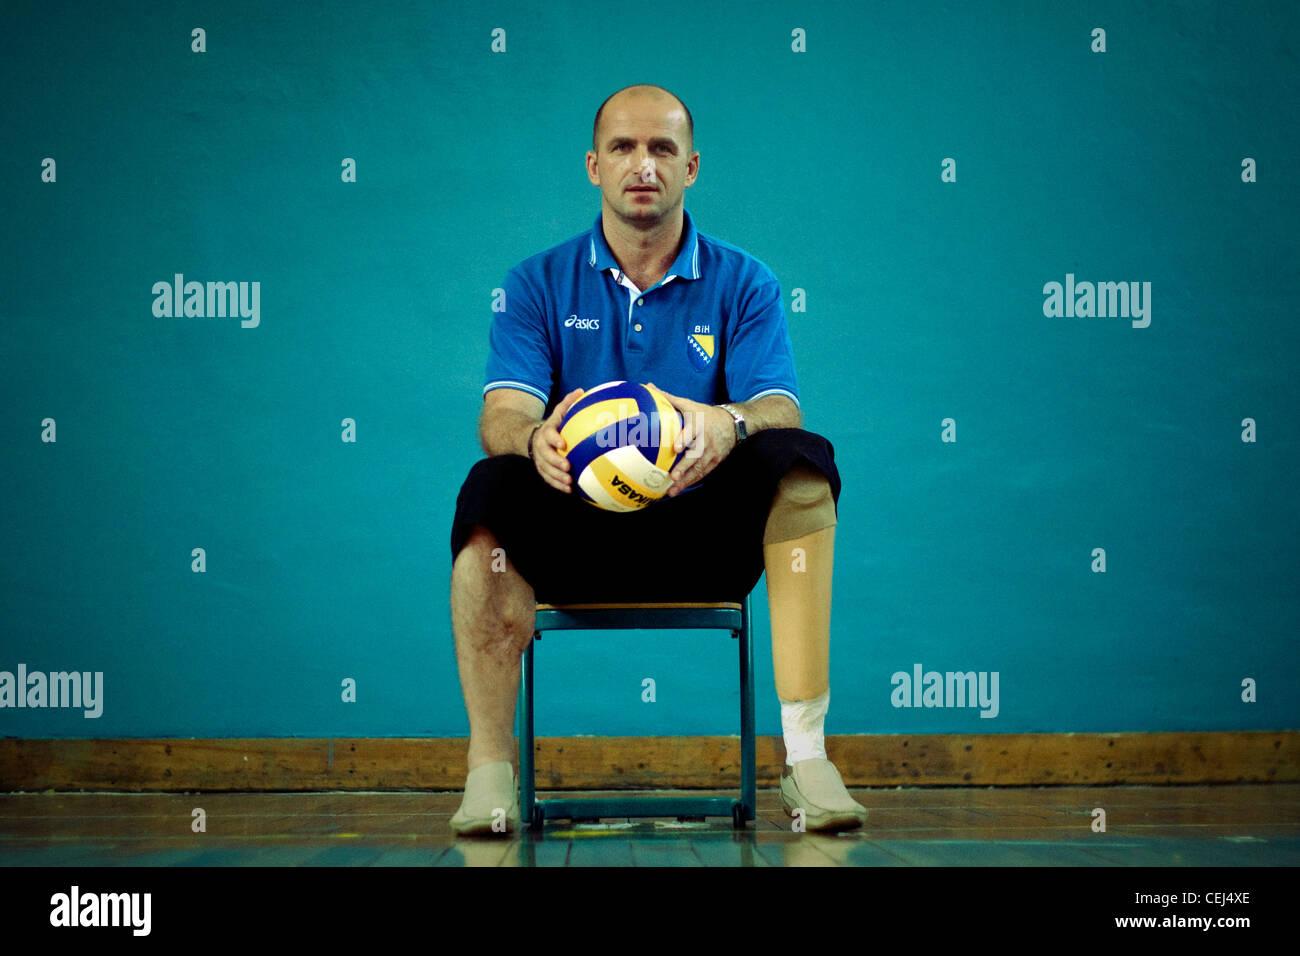 Color art fojnica - Zikret Mahmic A Member Of Bosnian Sitting Volleyball Team Fojnica Bosnia And Herzegovina